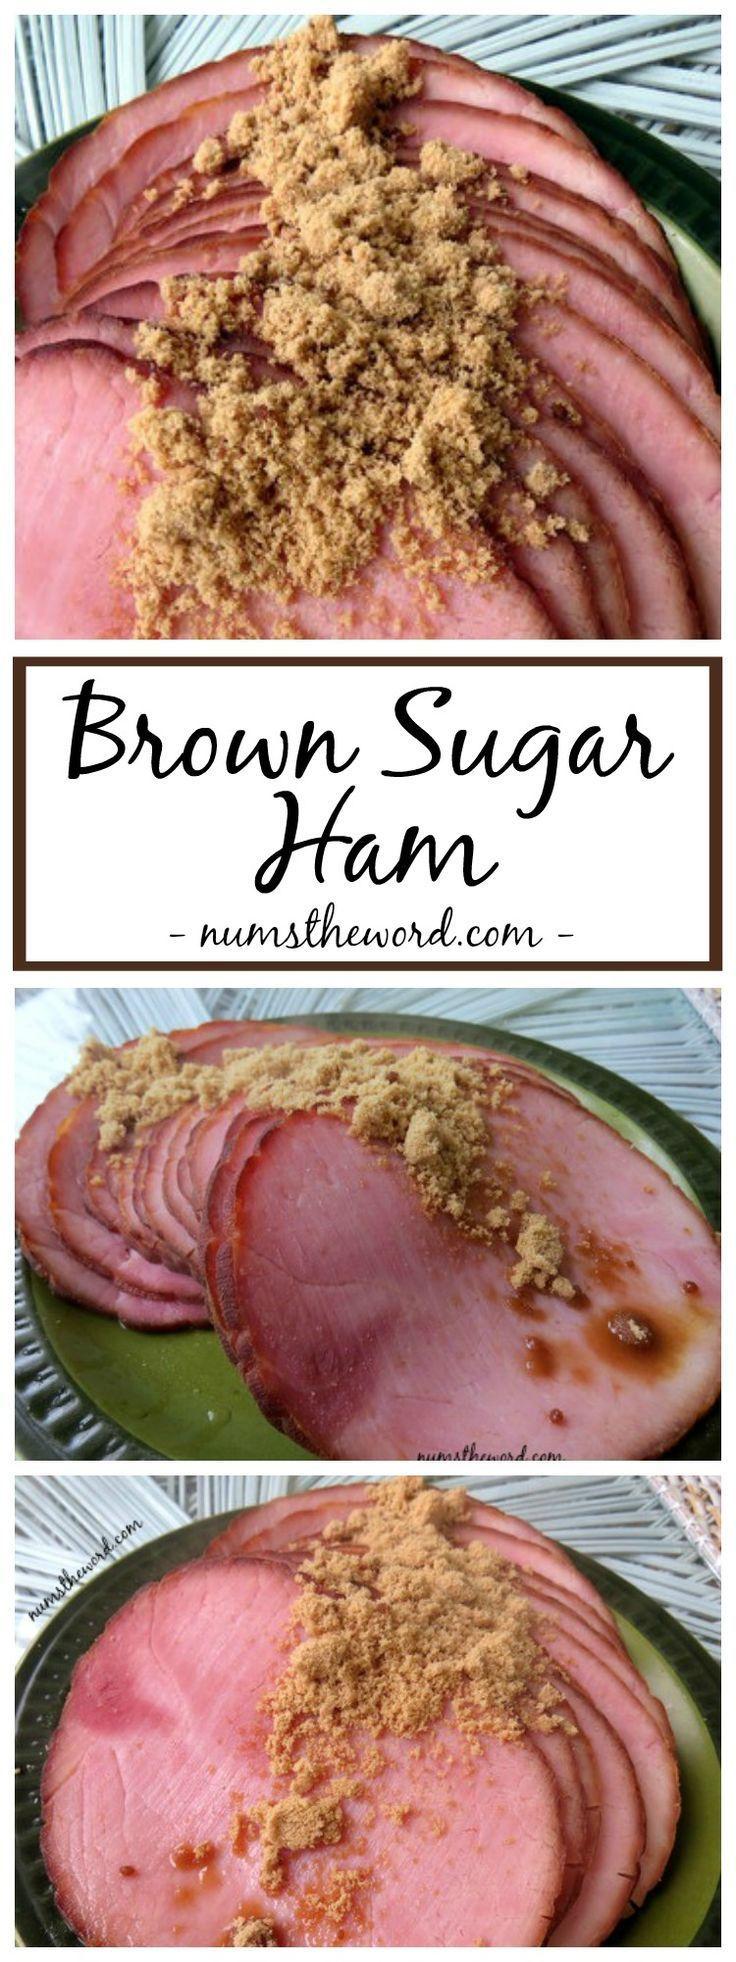 Brown Sugar Ham Num's The Word Brown sugar ham, Sugar